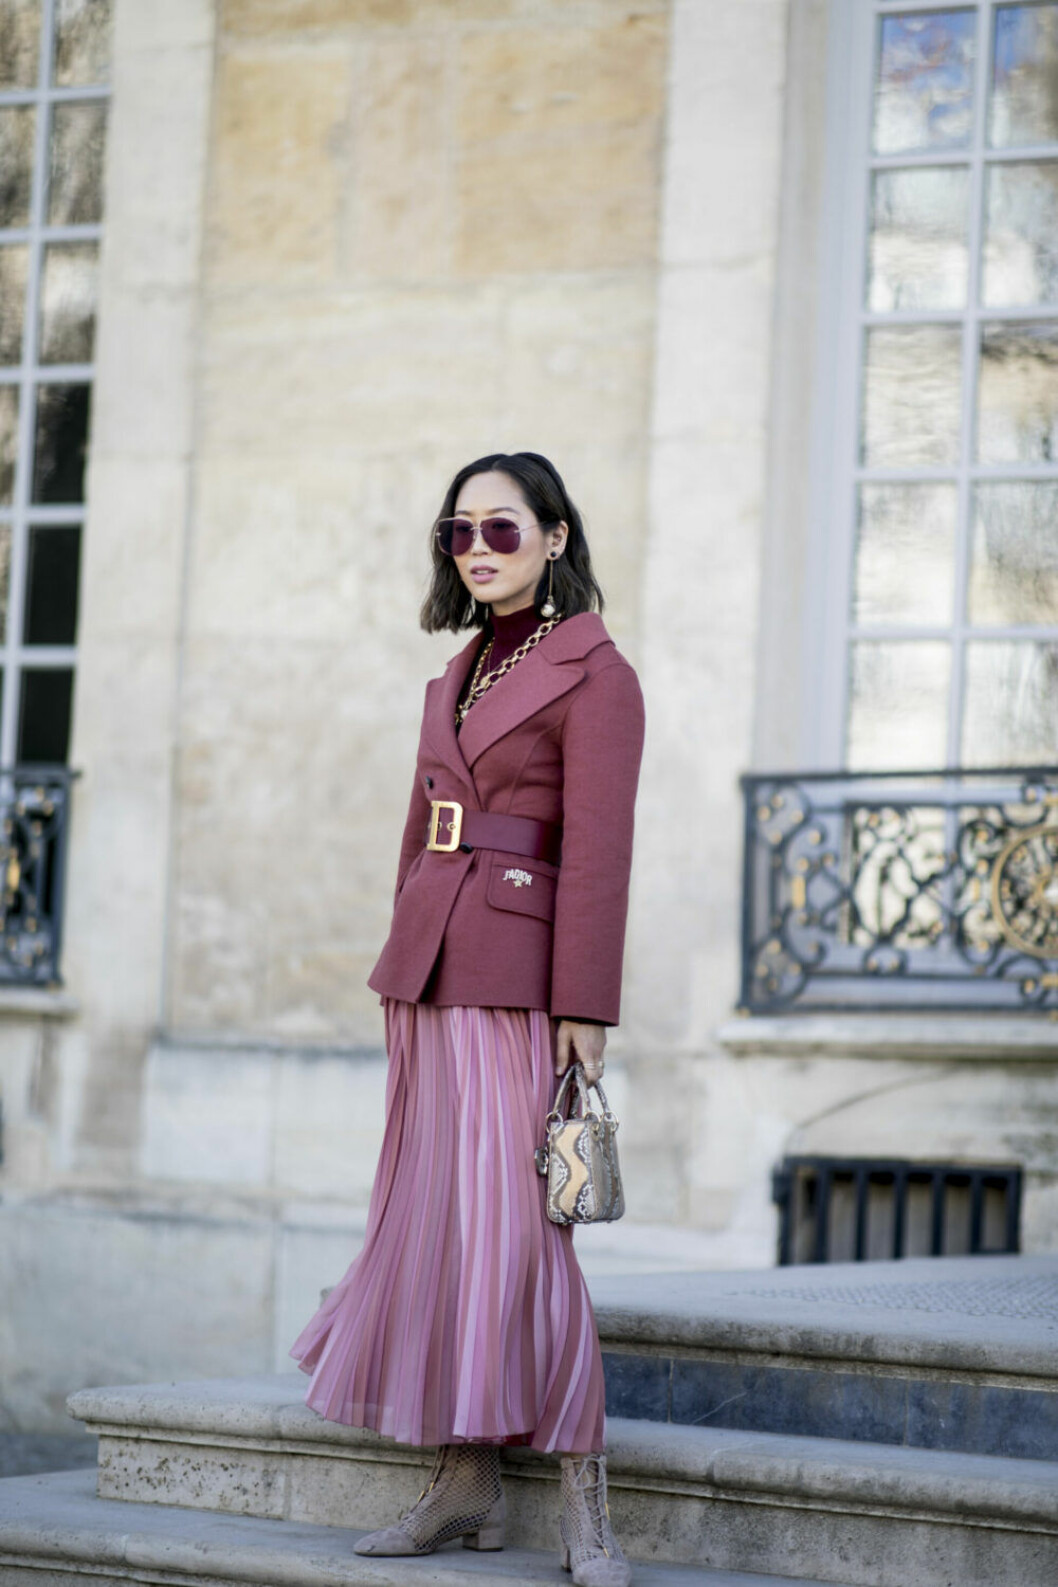 Streetstyle Paris FW, dior look.